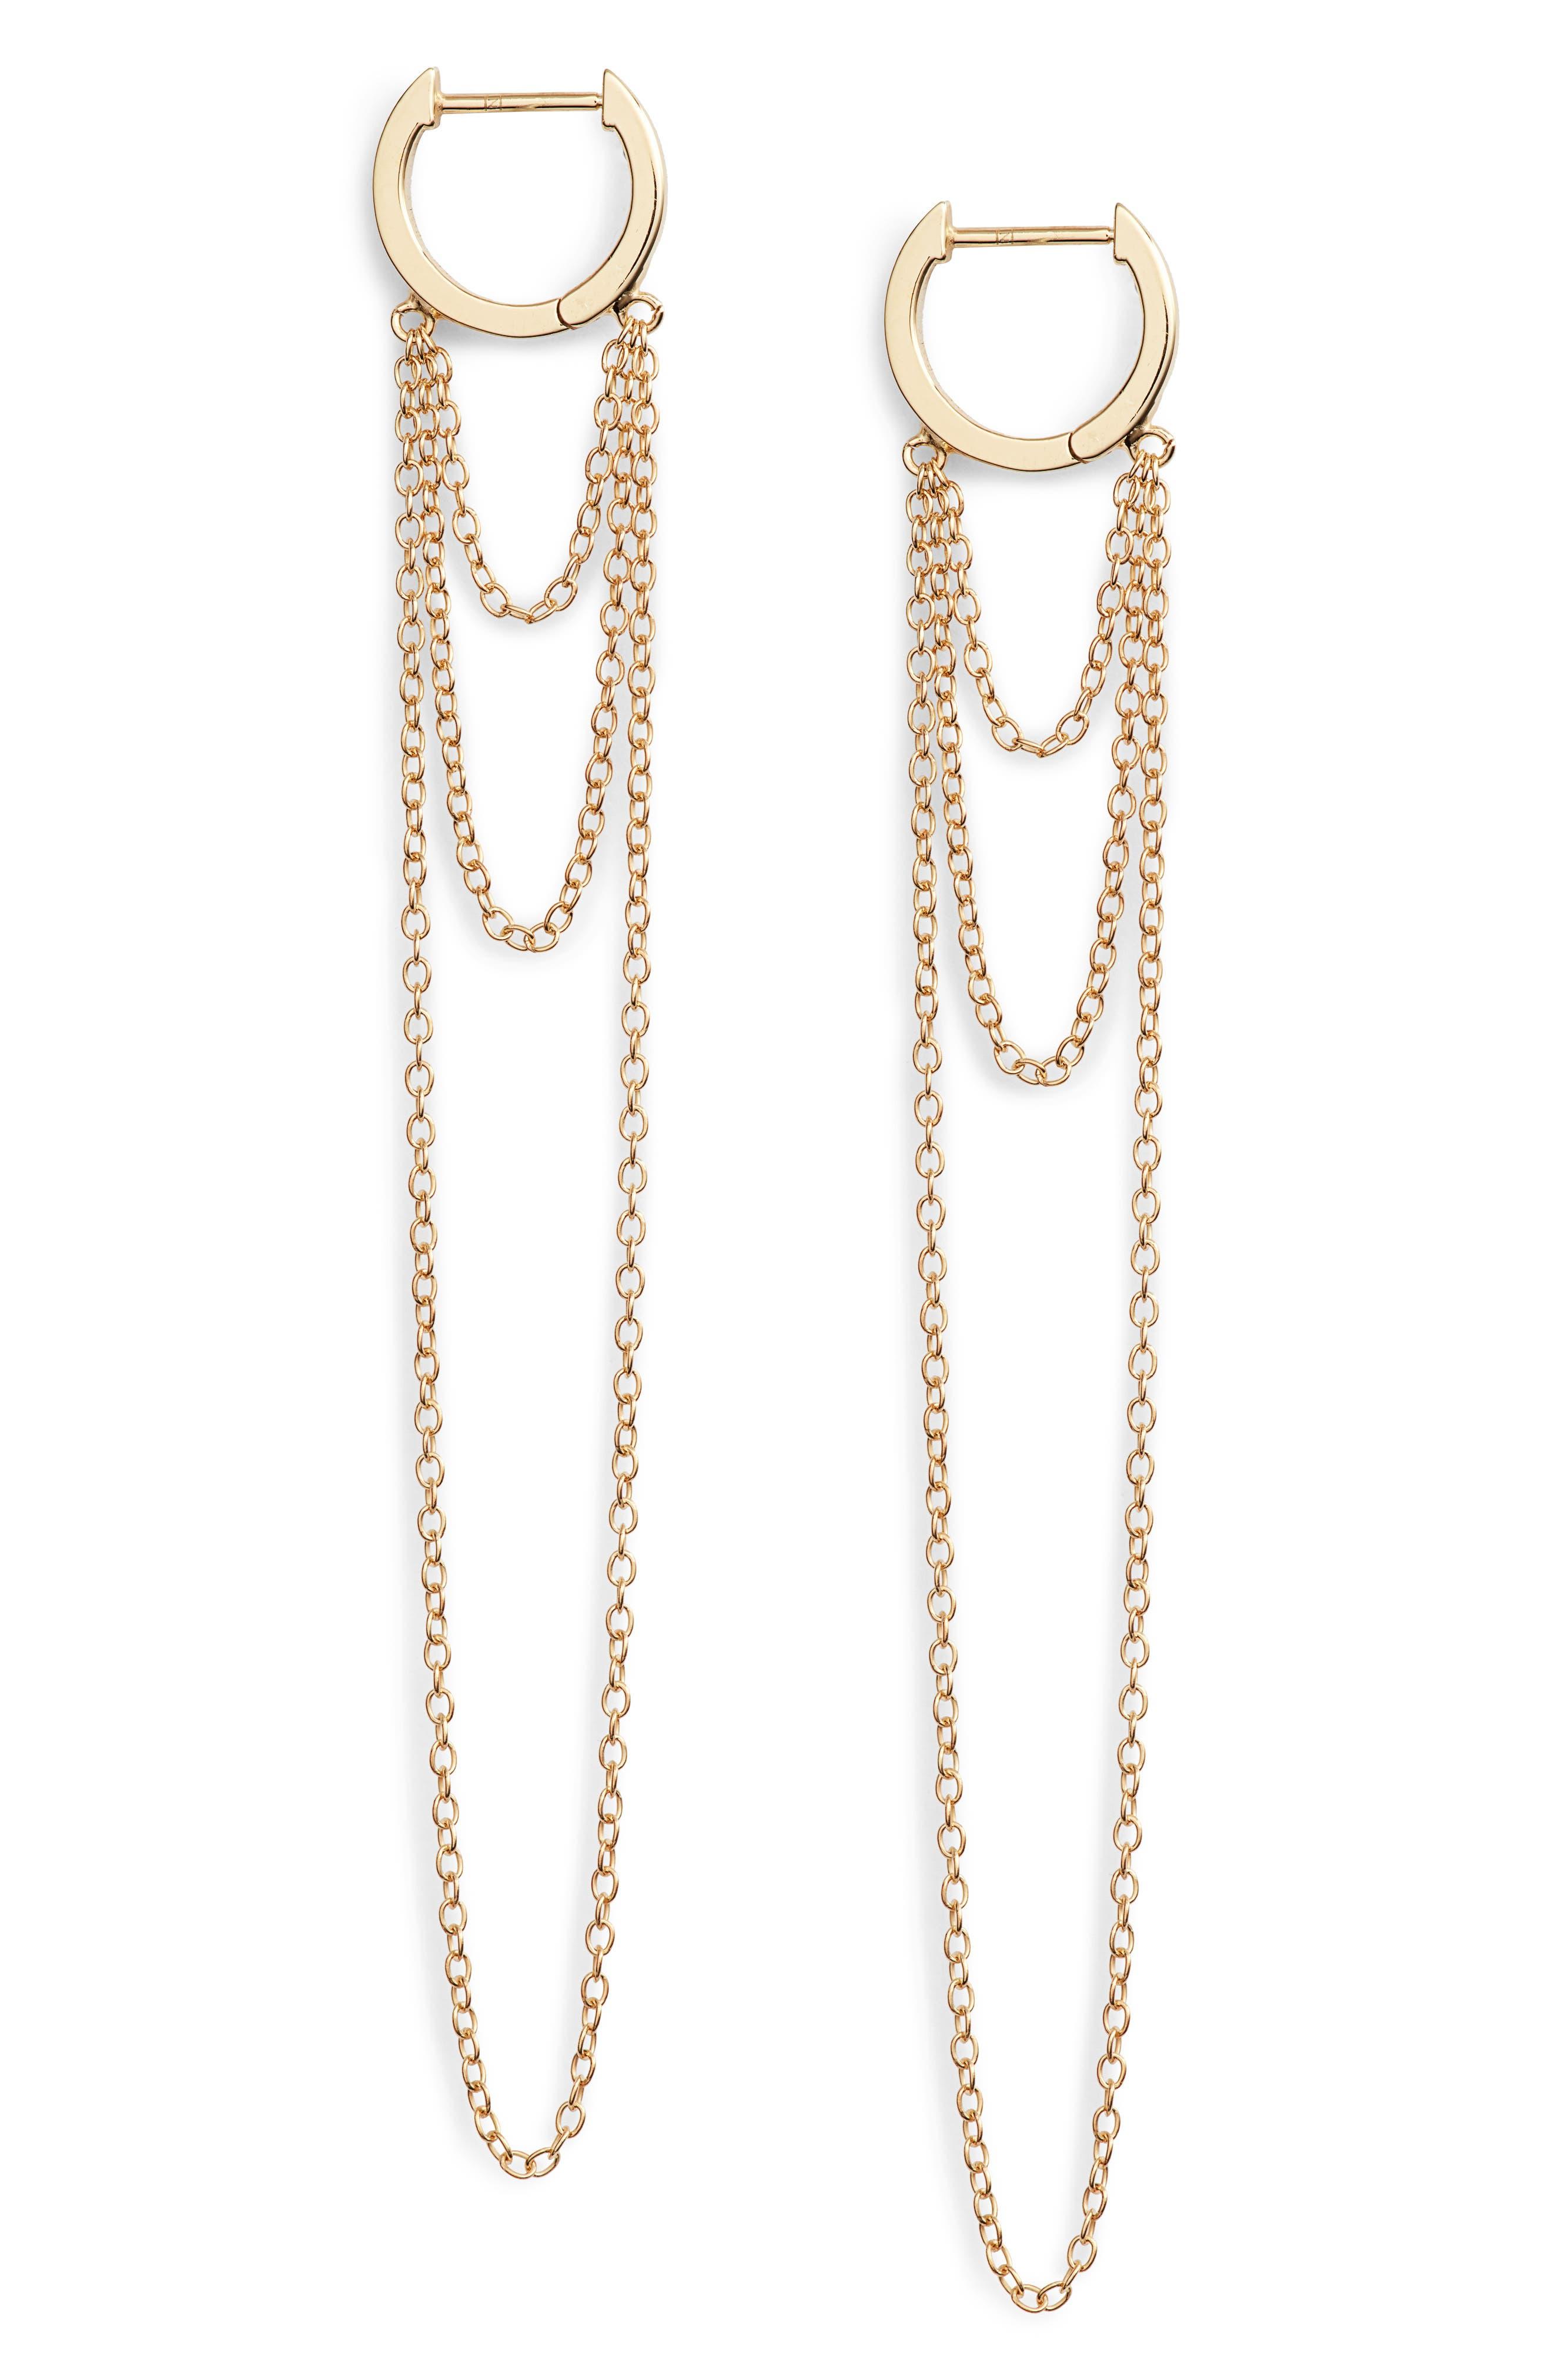 Elmar Huggie Chain earrings,                             Main thumbnail 1, color,                             710